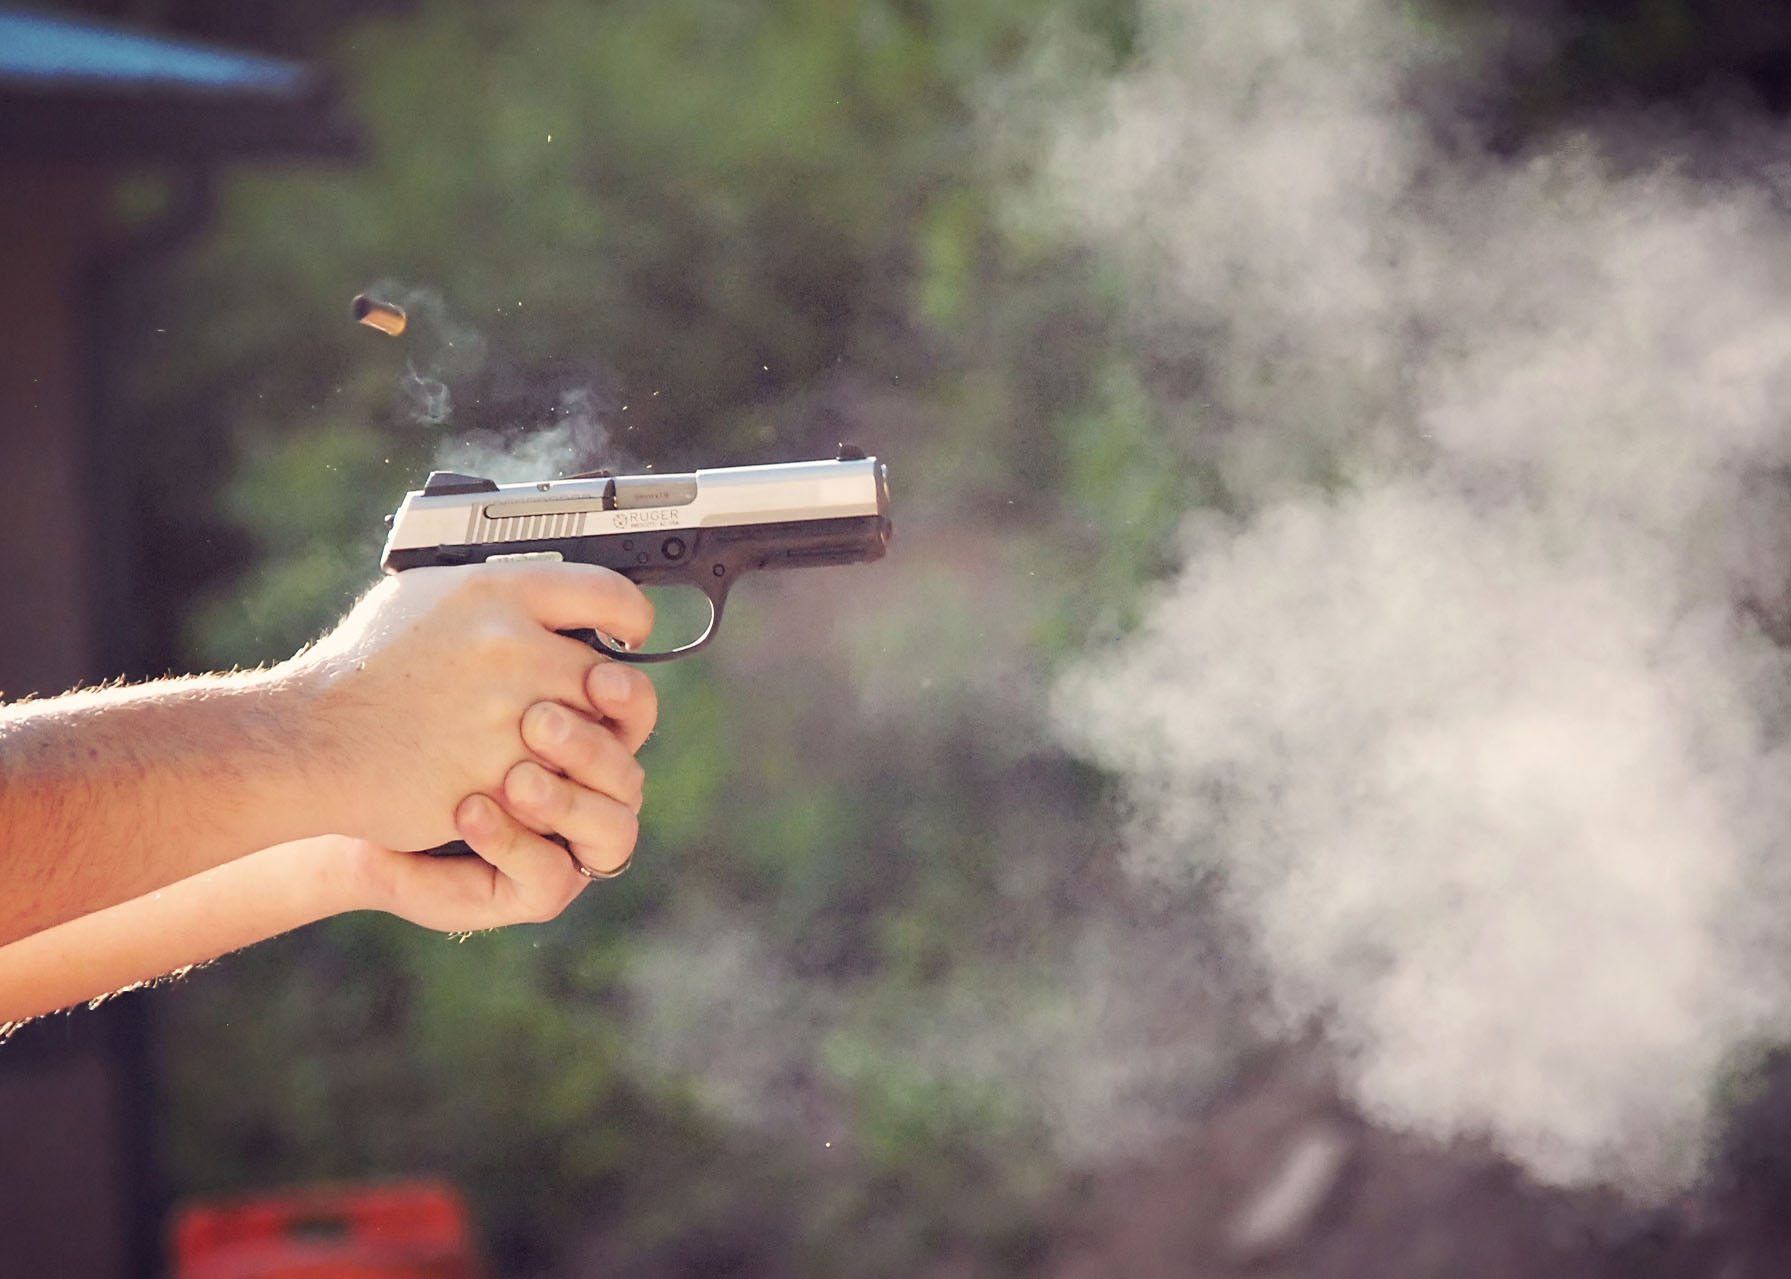 gun shots today